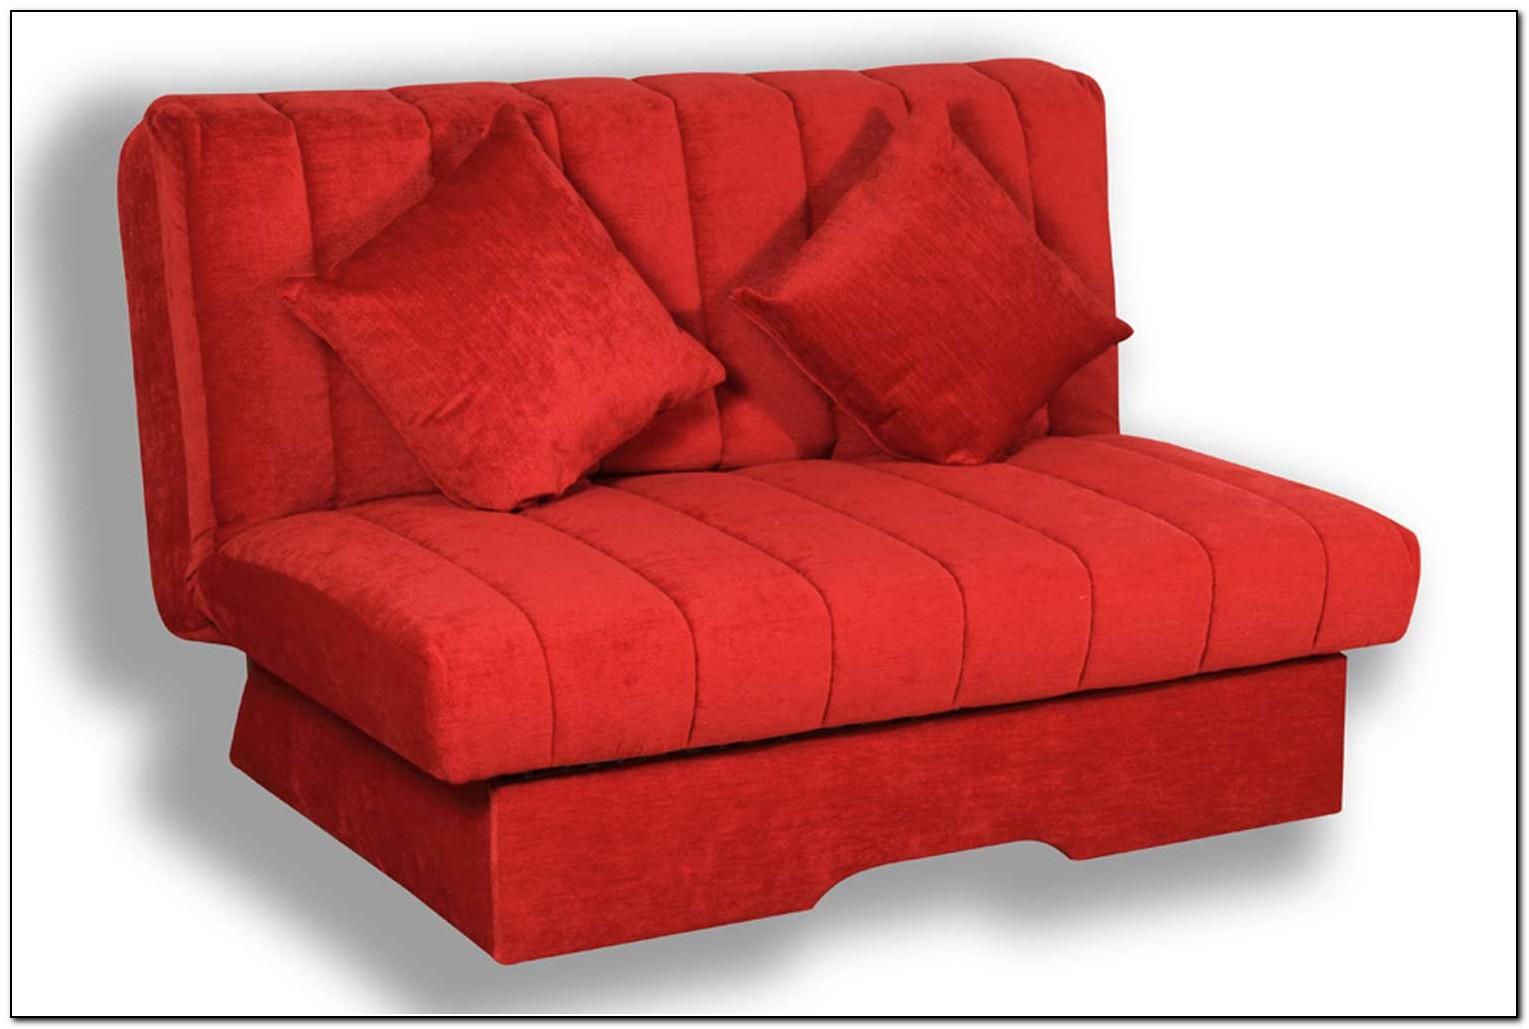 sofa bed uk under 100 simple set designs for living room cheap beds Â100 download page  home design